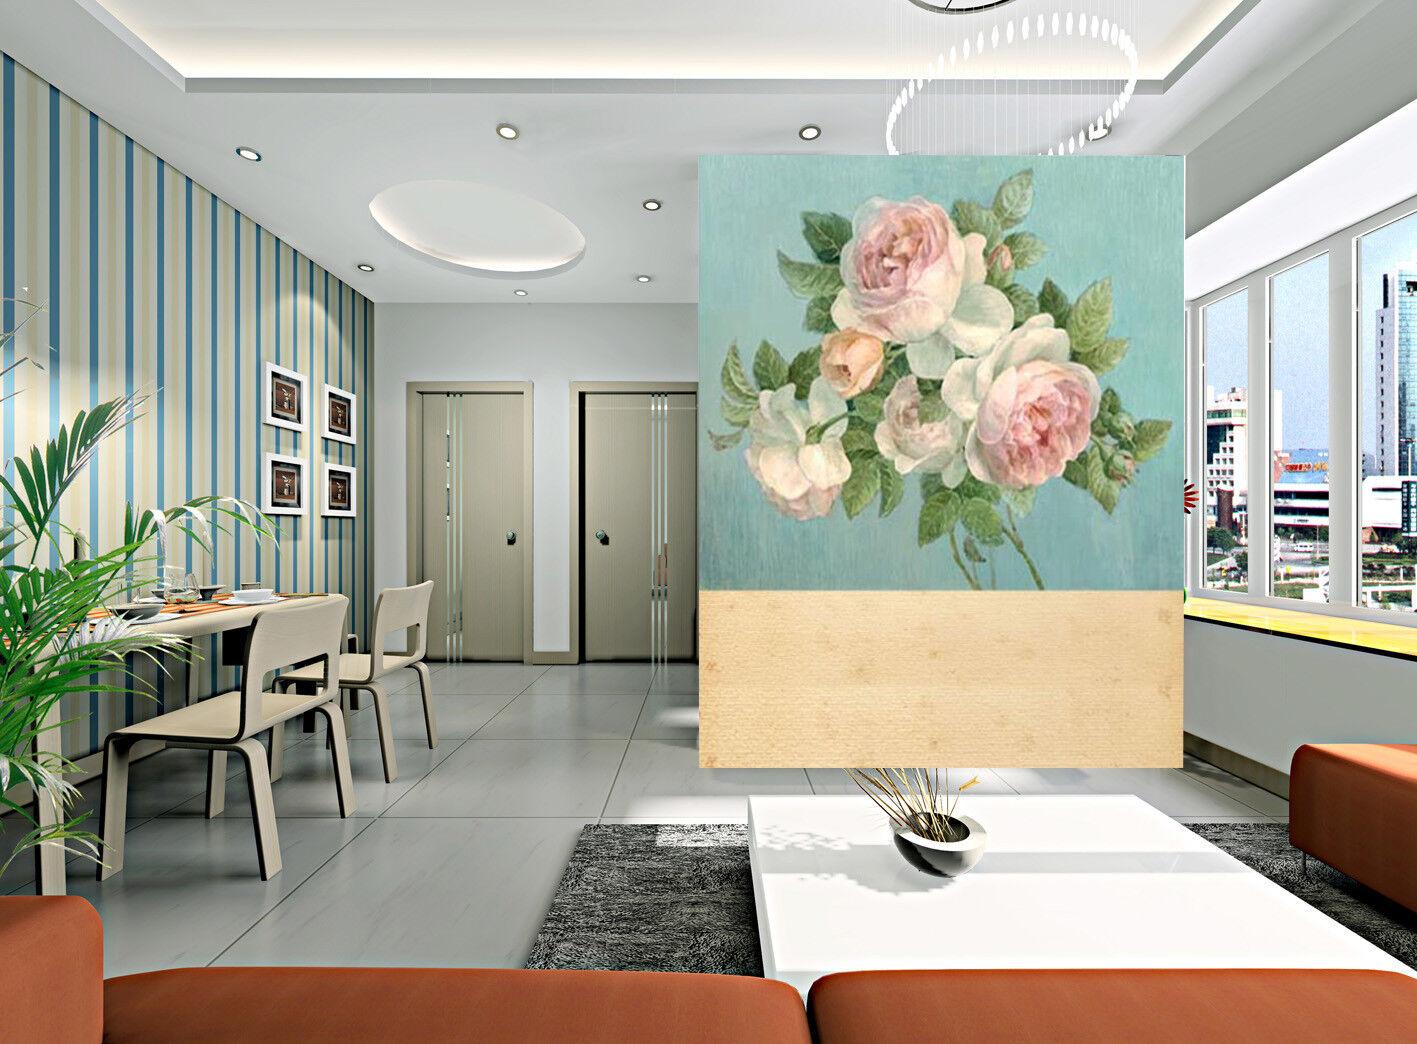 3D Kunst Blaumen 799 799 799 Tapete Wandgemälde Tapete Tapeten Bild Familie DE Lemon | Die Königin Der Qualität  | Internationale Wahl  | Online-Exportgeschäft  22364d